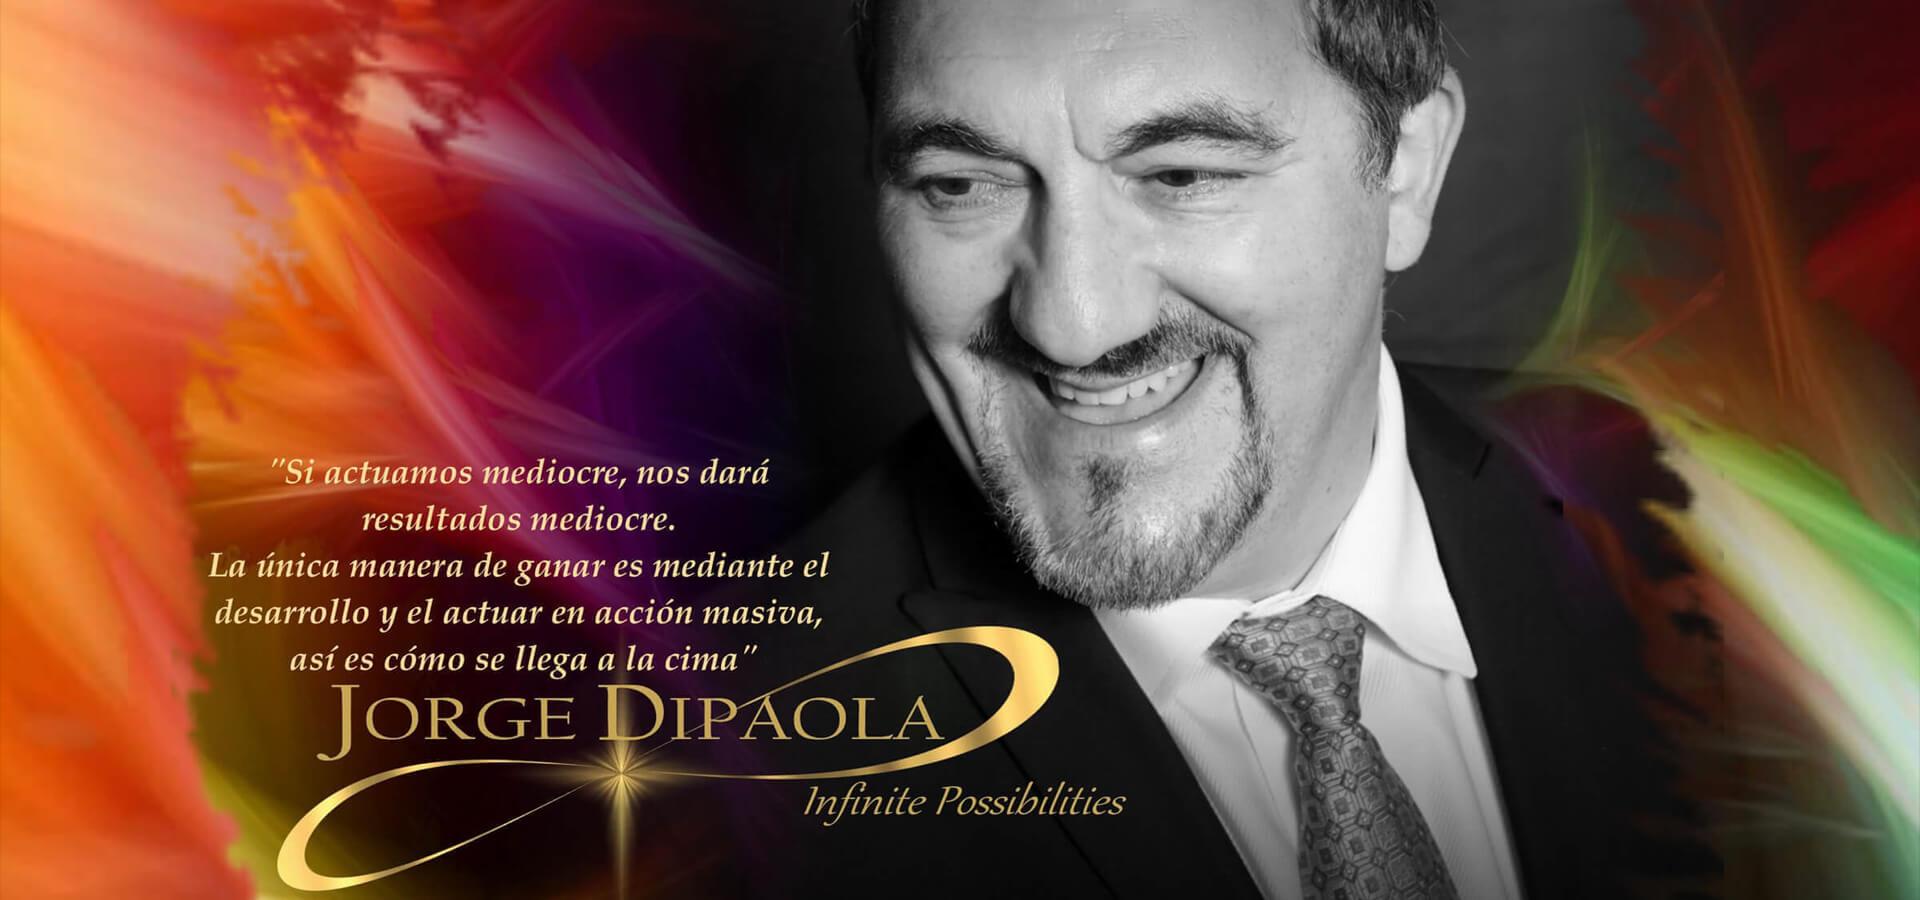 Jorge Di Paola pic 01